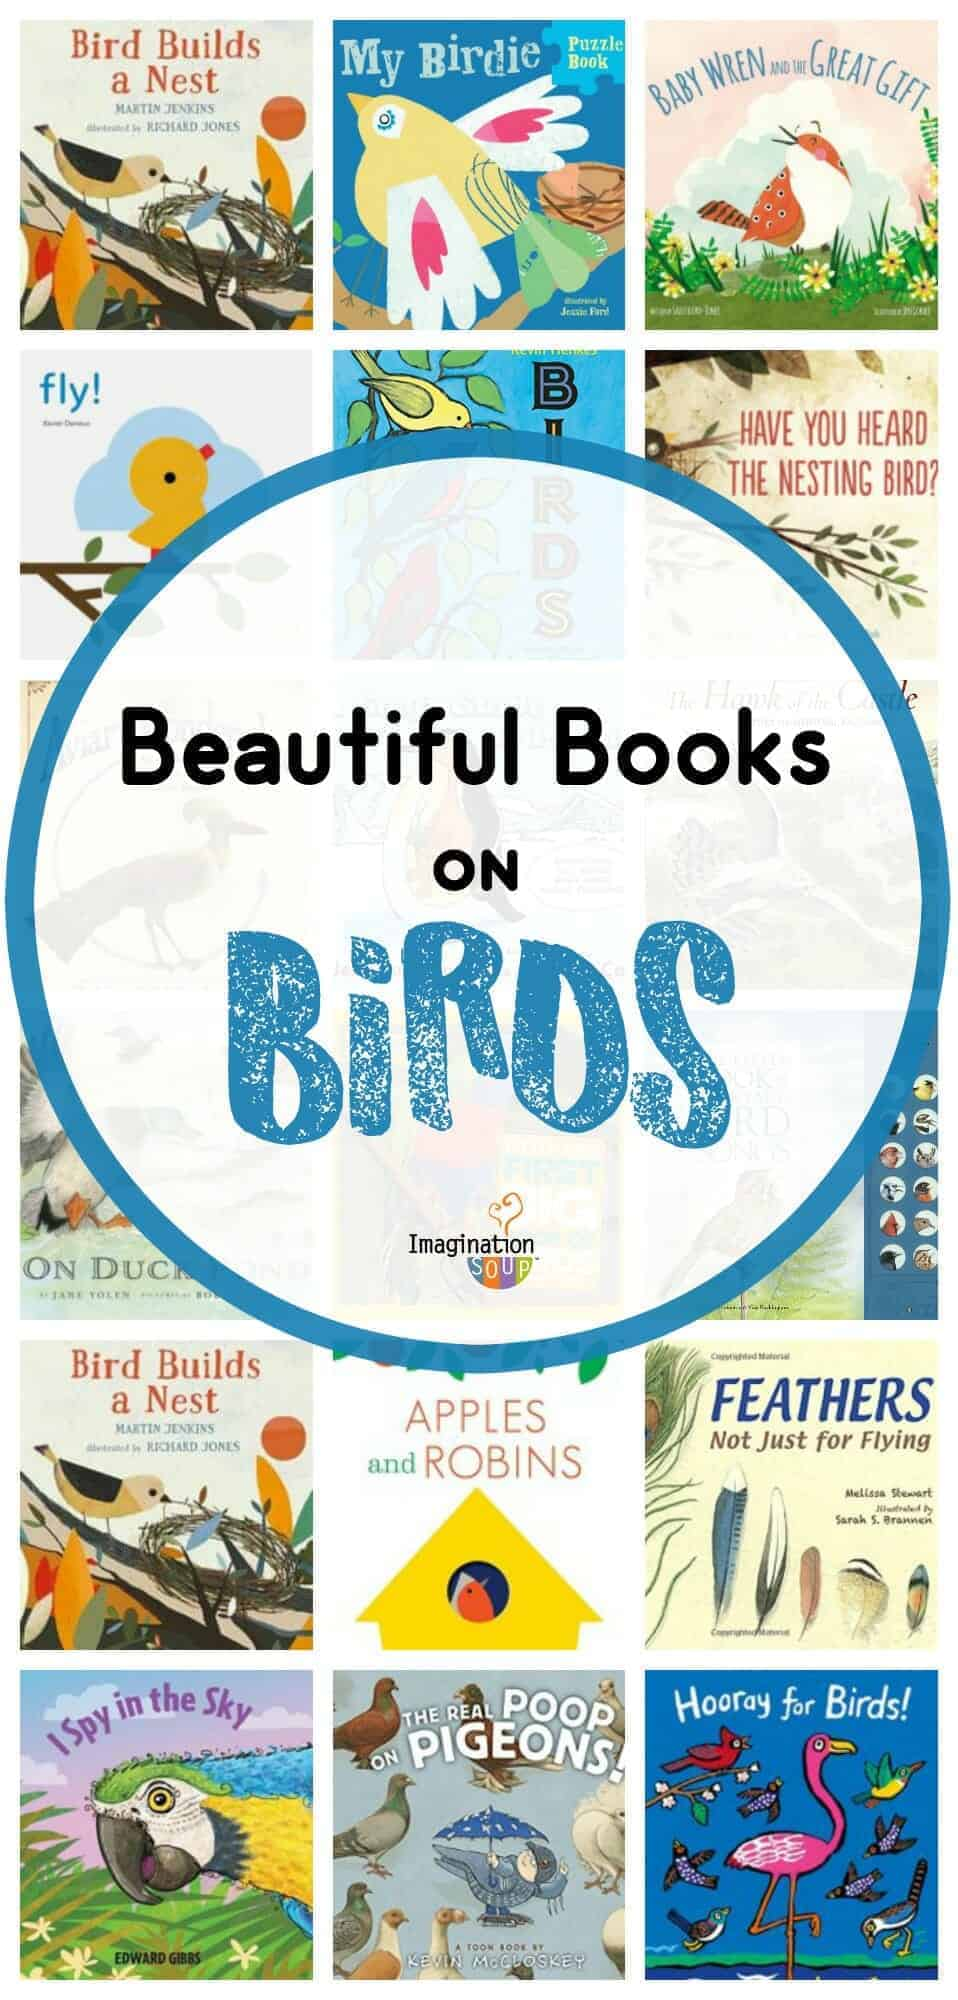 beautiful children's books about birds